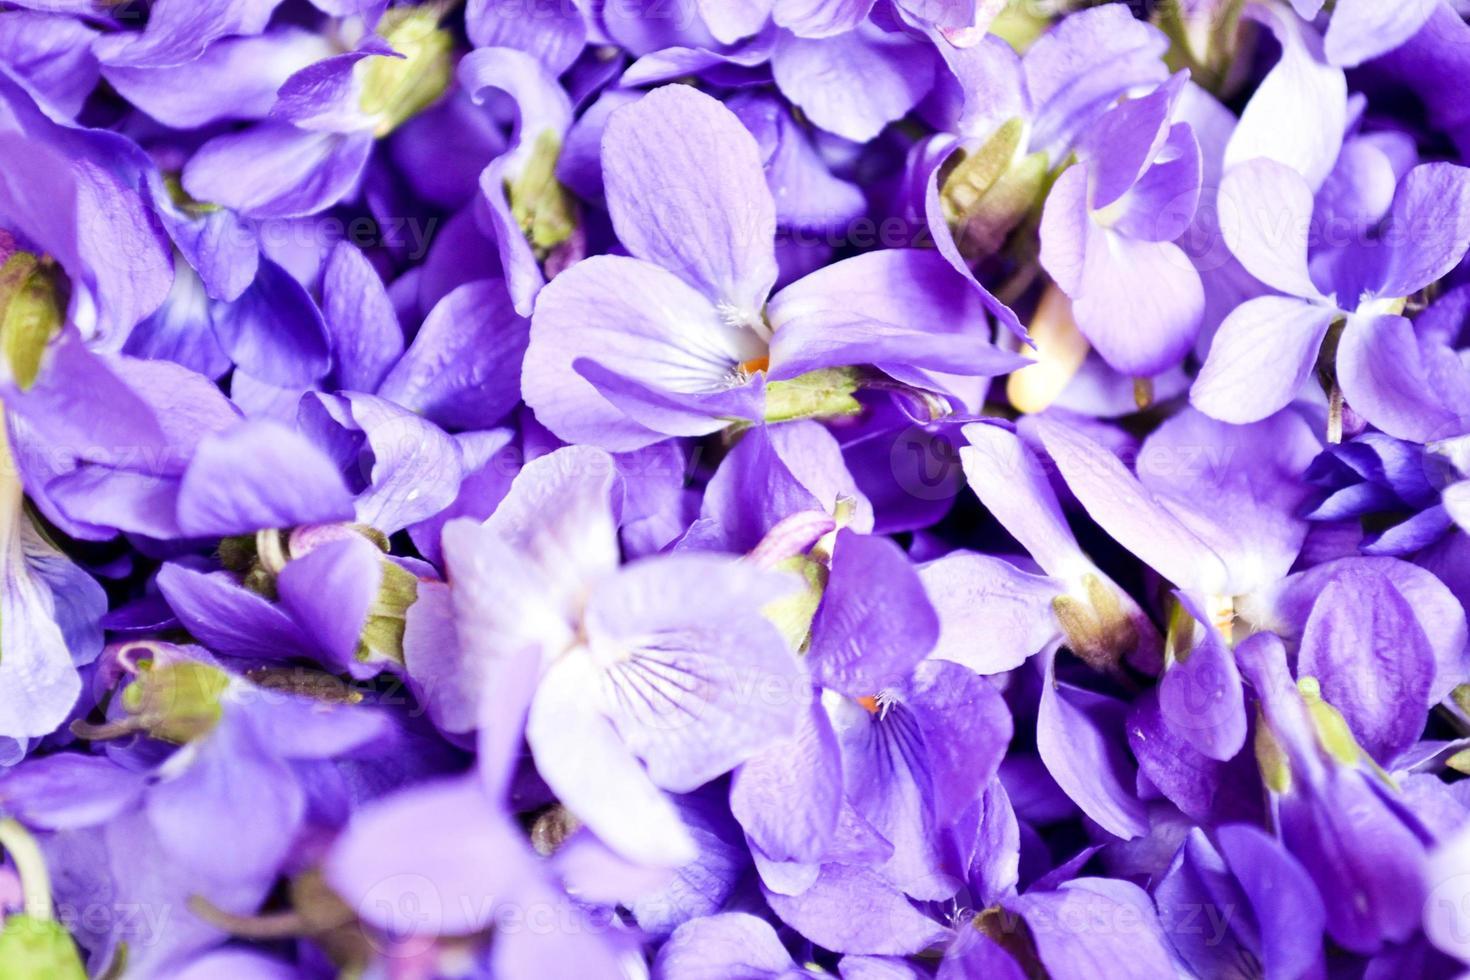 Violets flowers photo